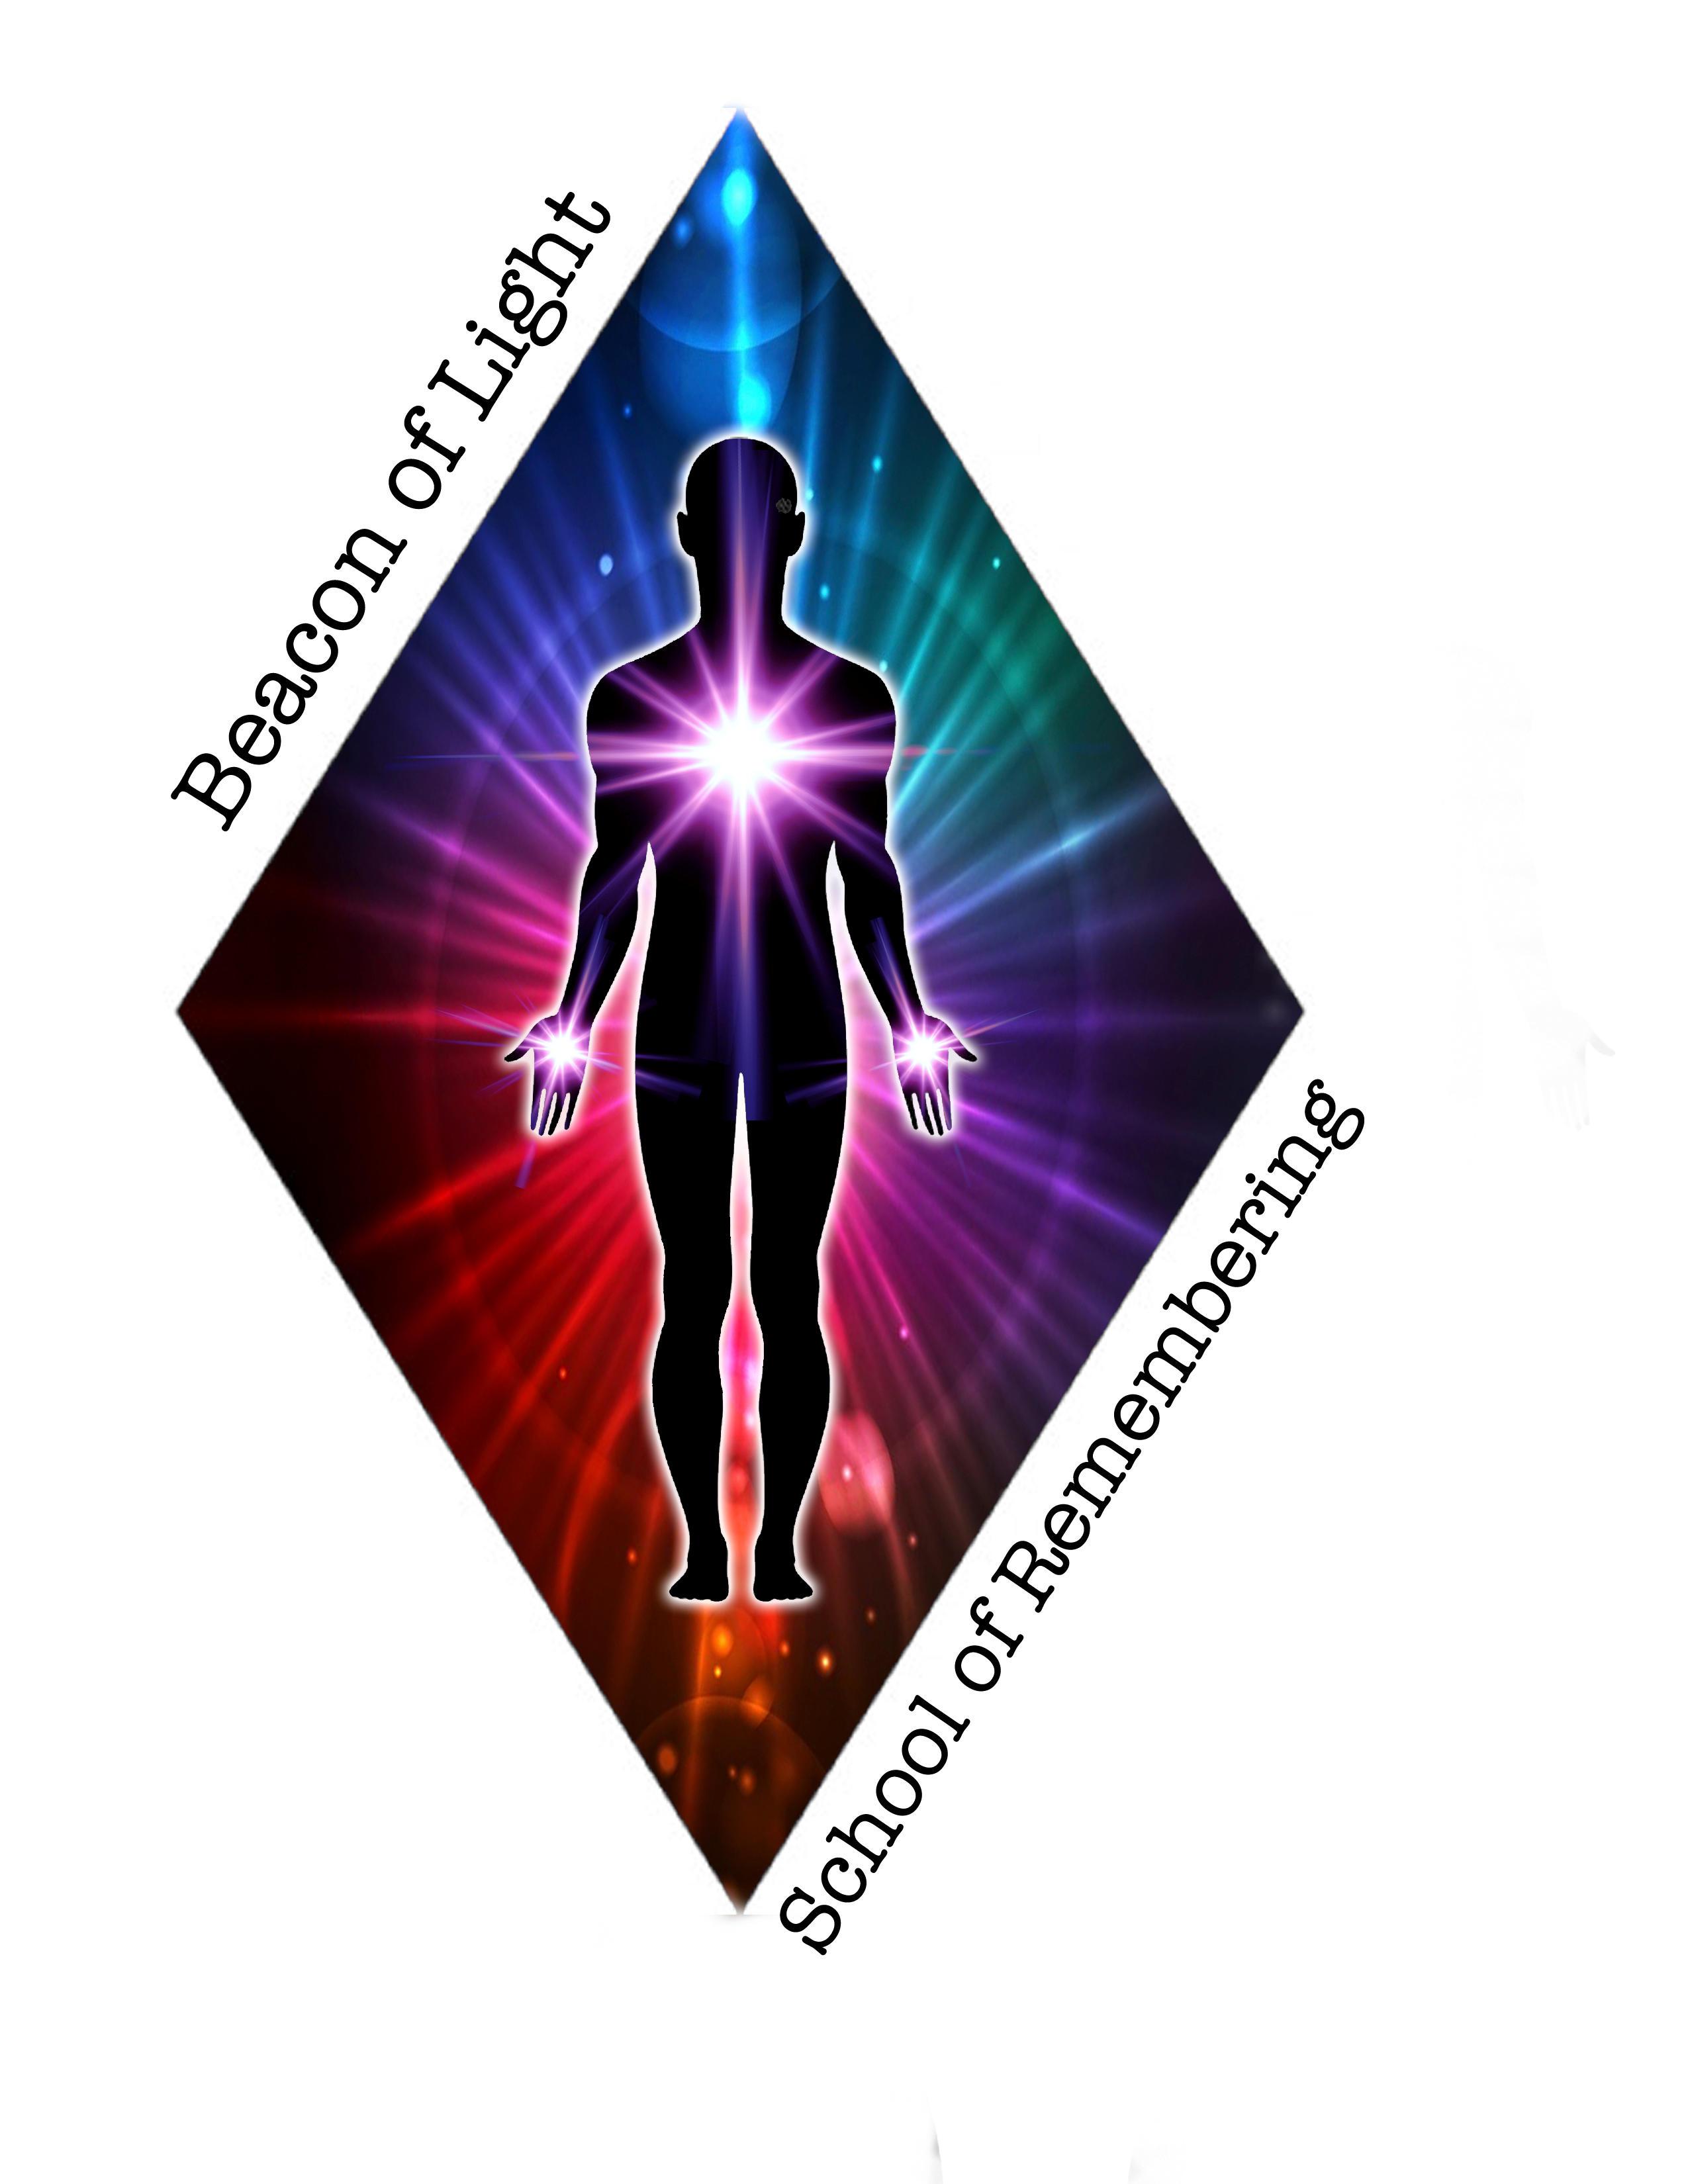 Beacon of Light image 0